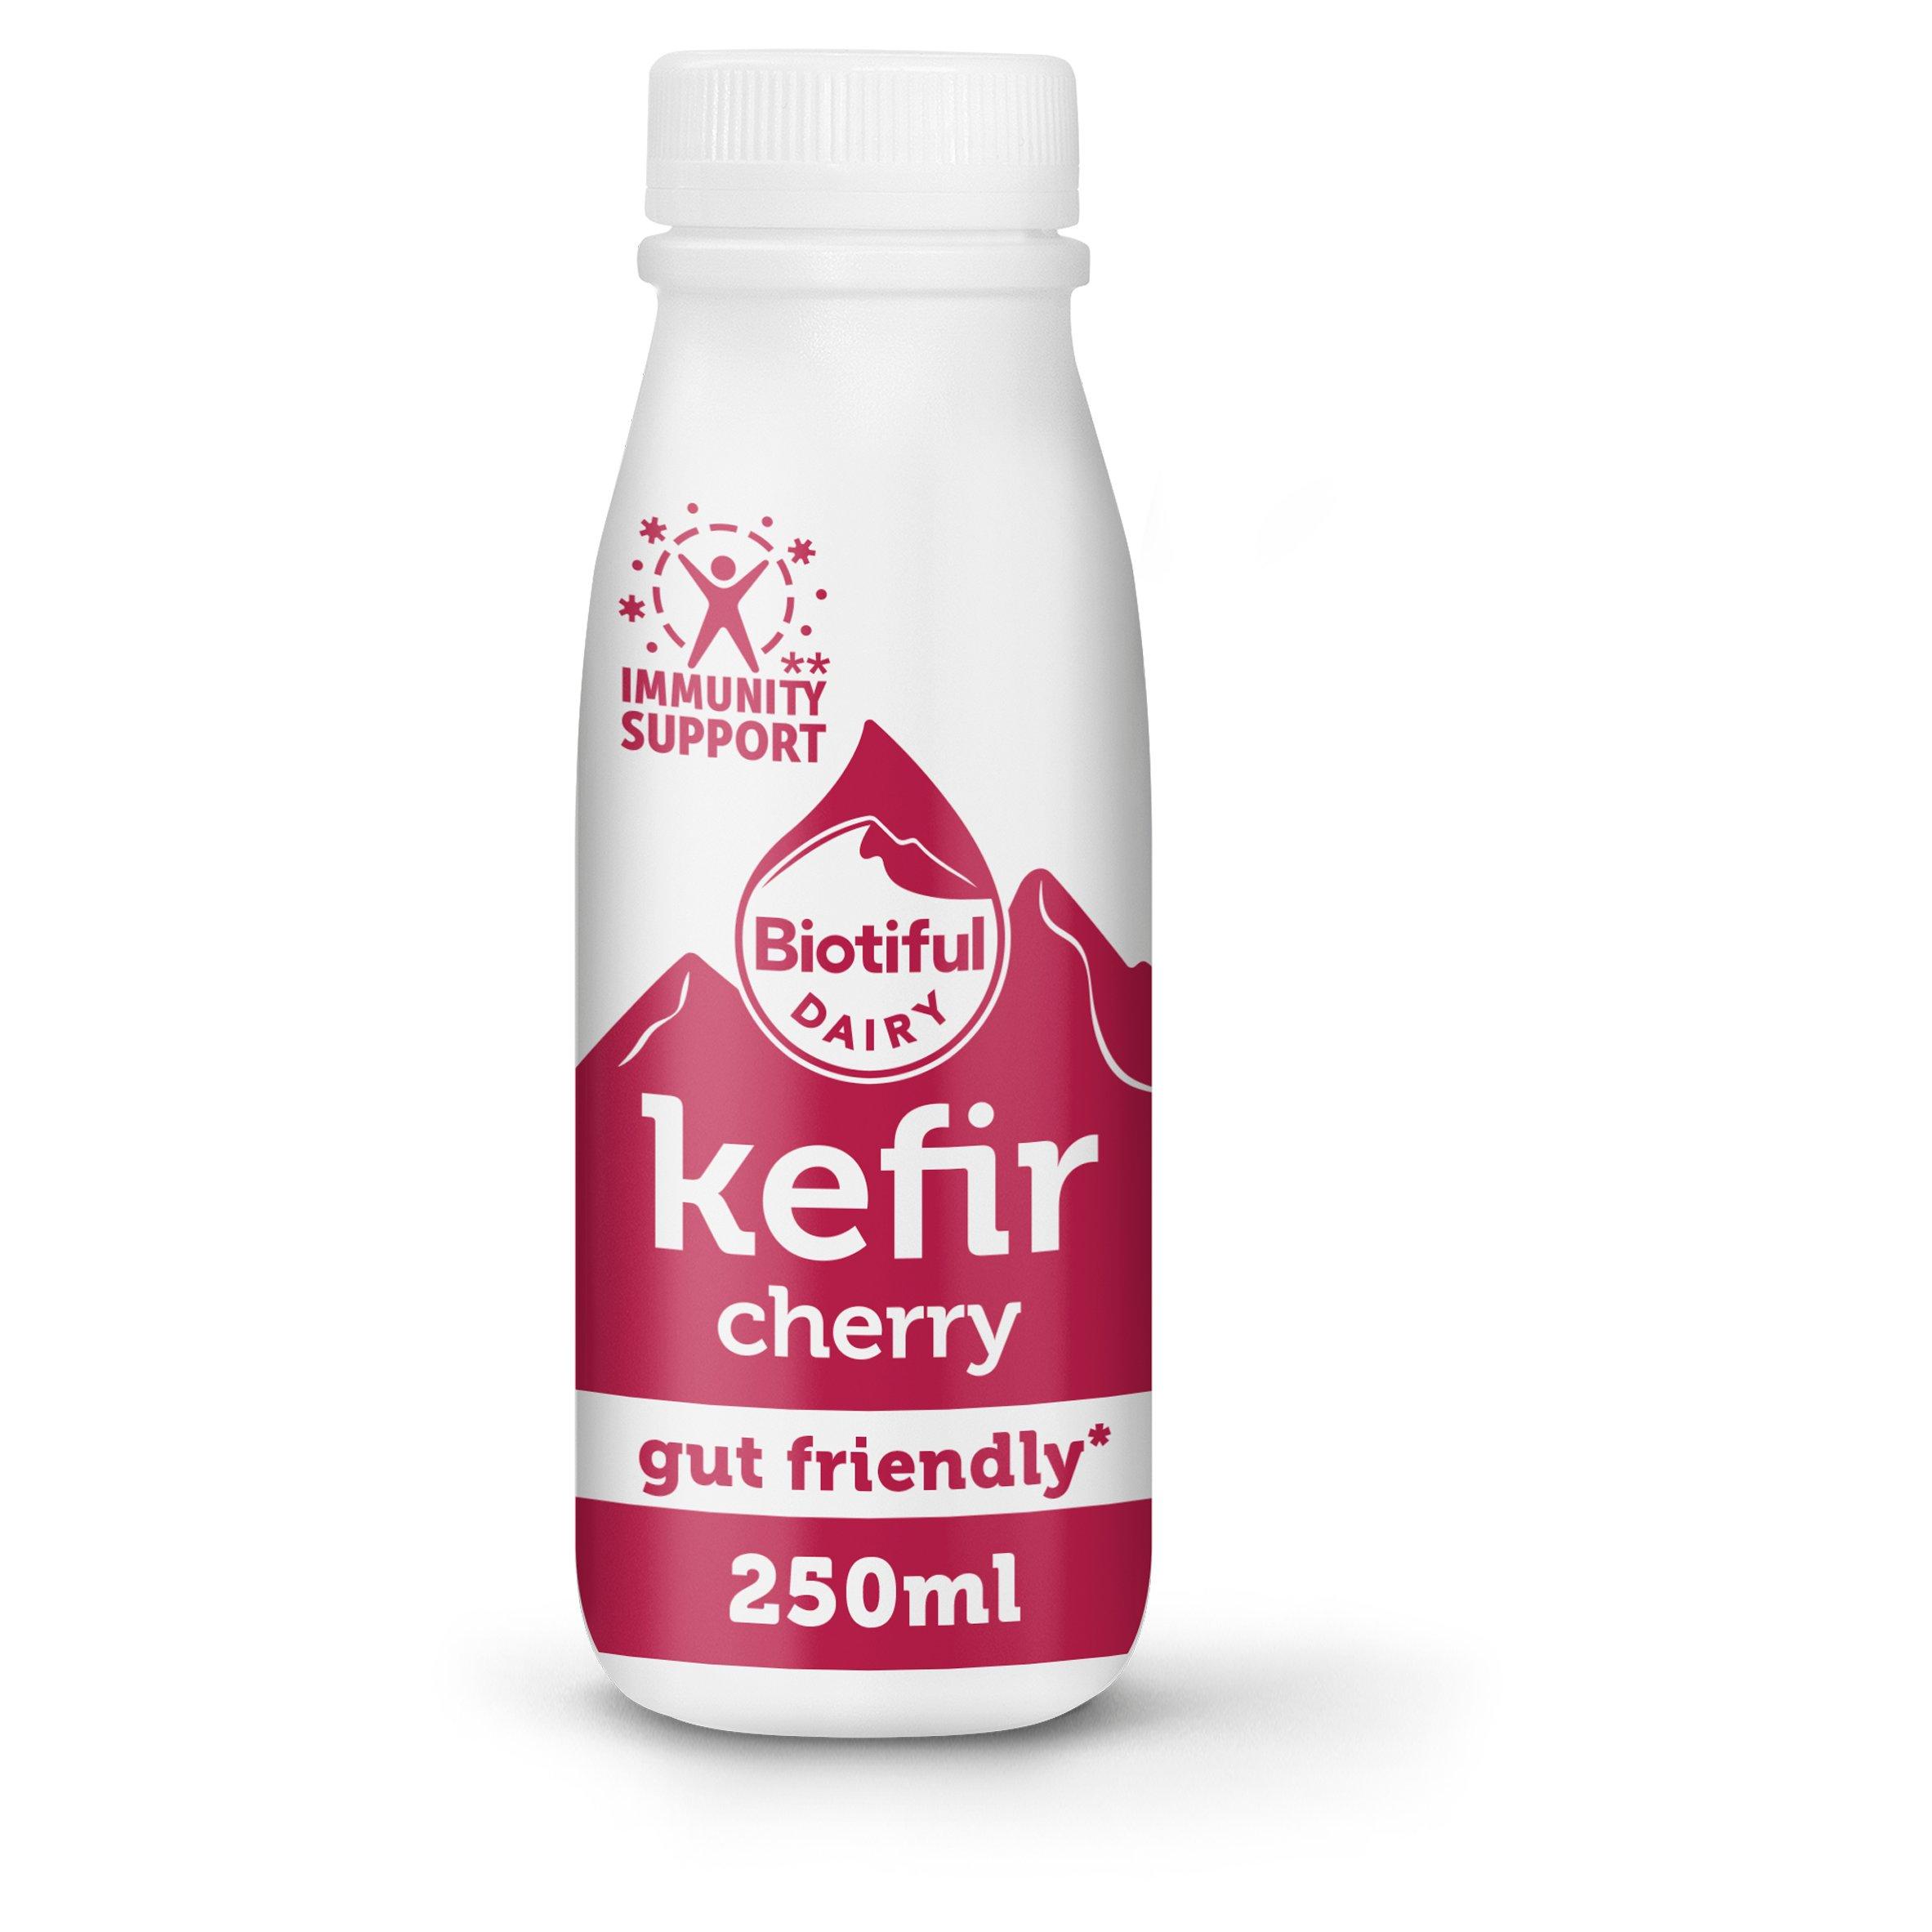 Bio-Tiful Cherry Kefir Smoothie 250Ml